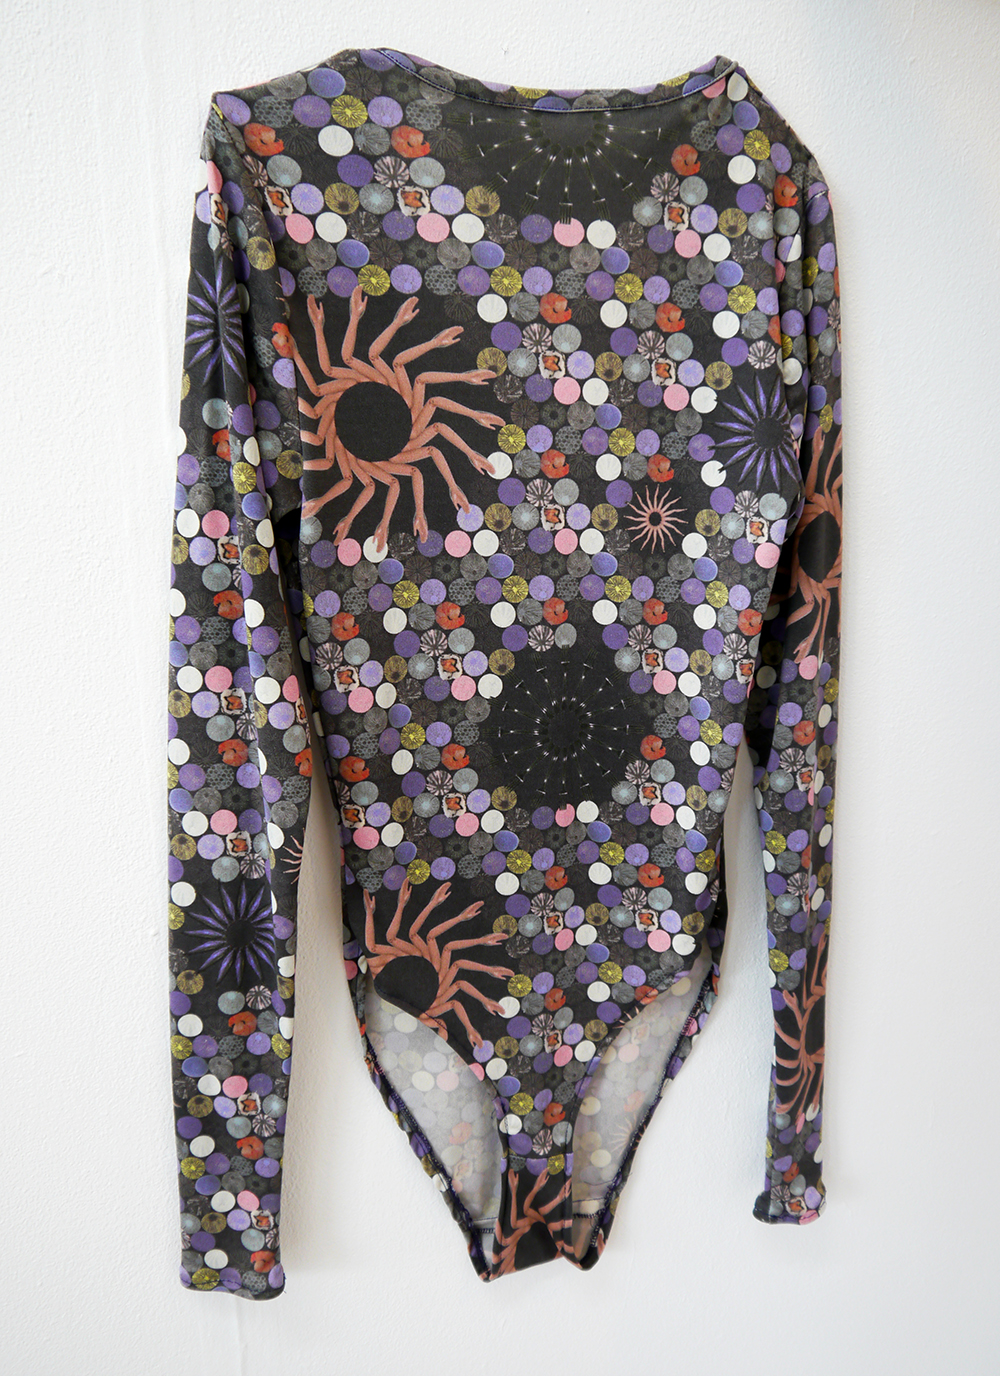 DJCAD, Duncan of Jordanstone College of Art and Design, degree show, Dundee, degree show 2015, #djcaddegreeshow, #djcaddegreeshow15, textile design, printed fabric, Caitlin Miller